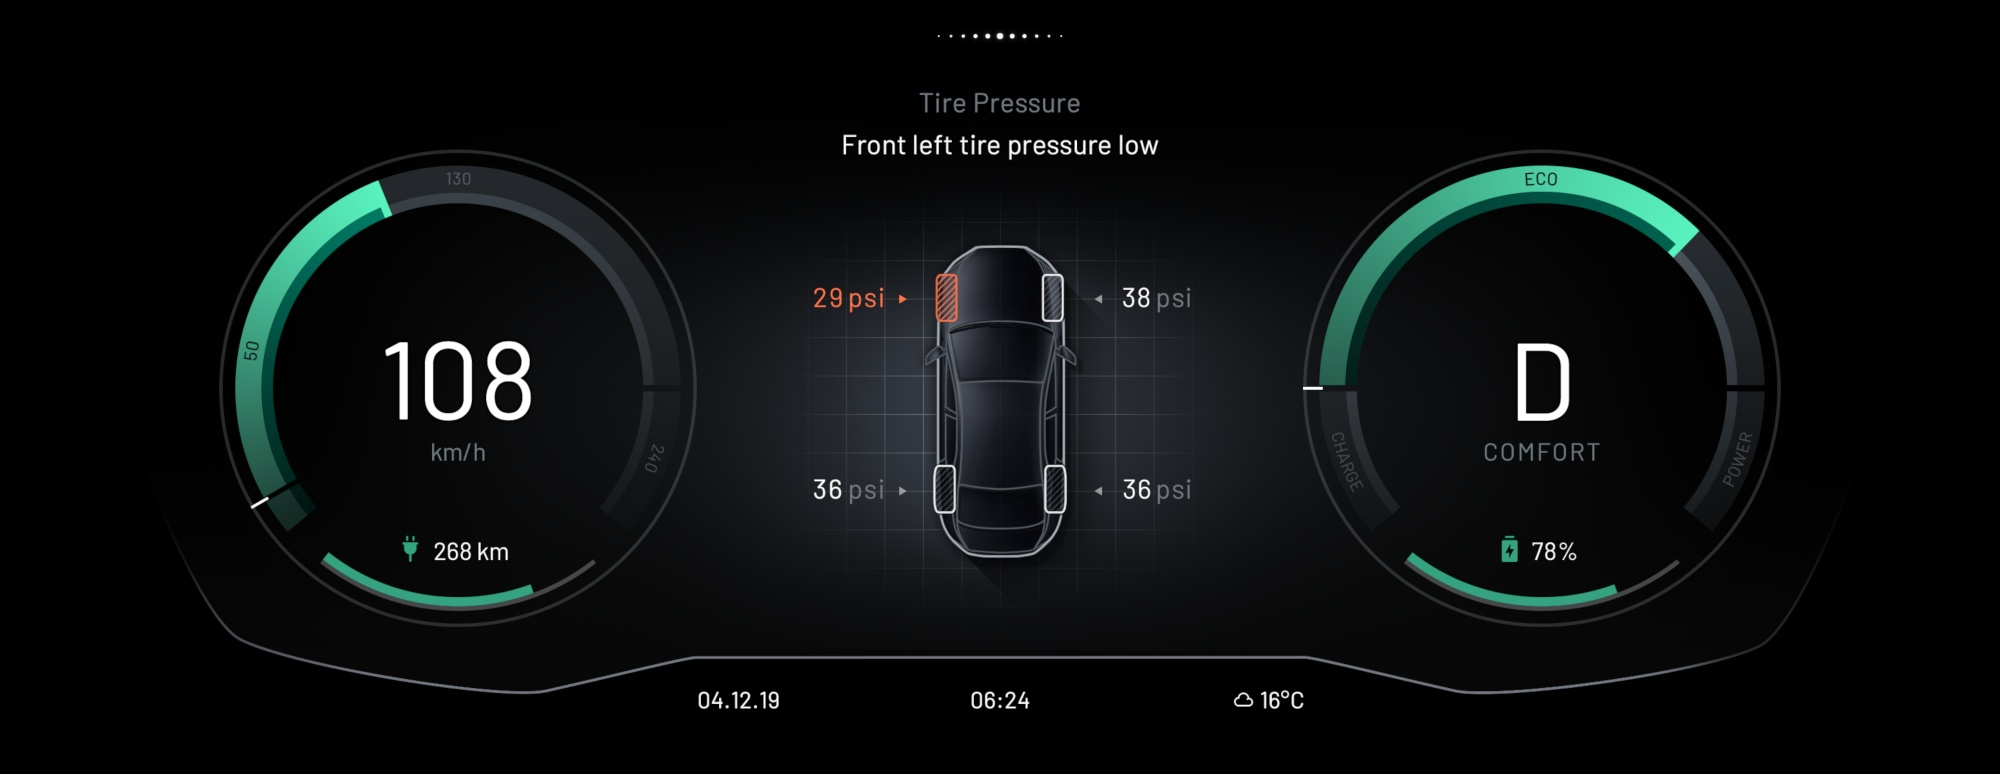 EB GUIDE Car HMI Tire Pressure